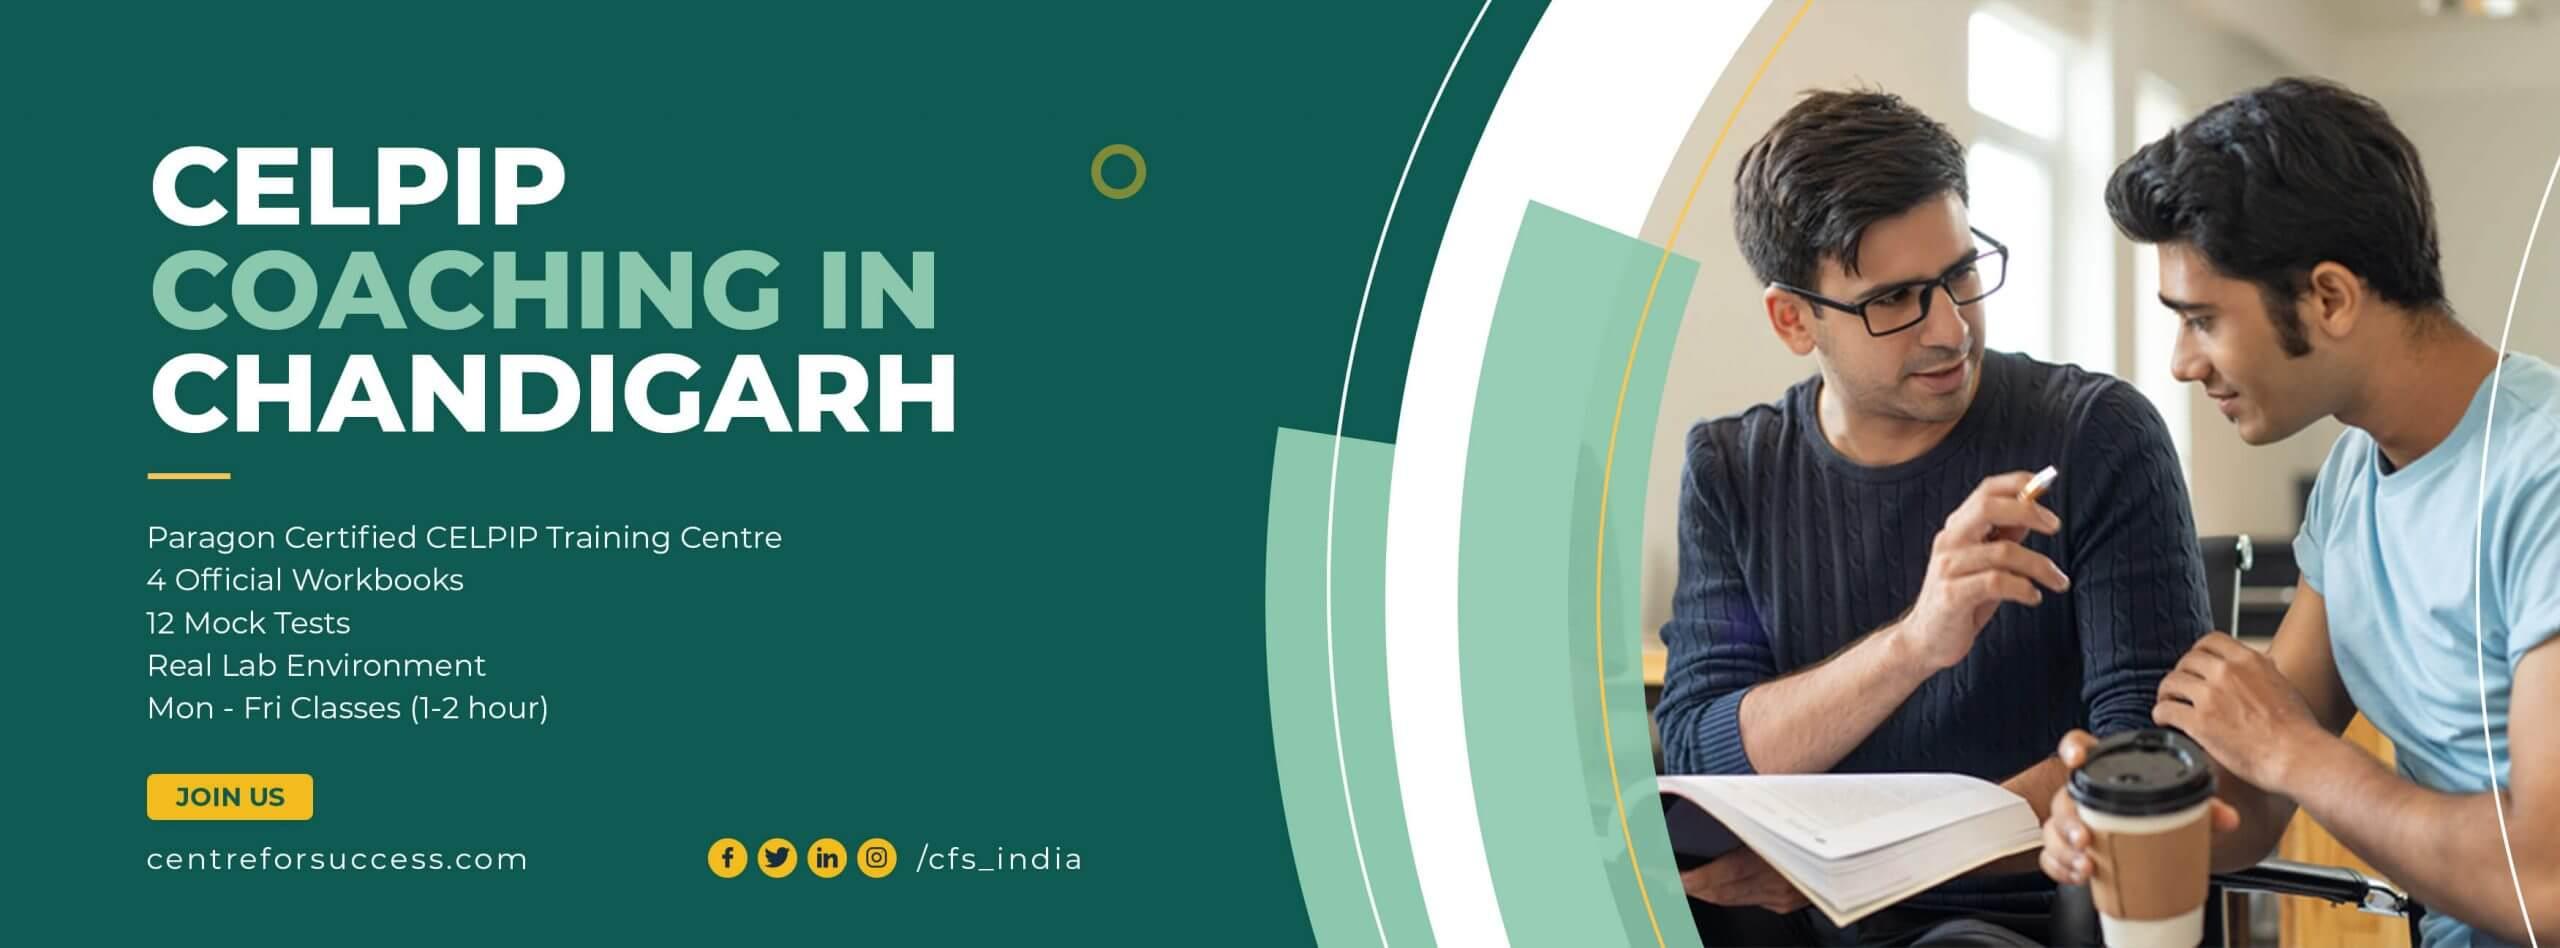 CELPIP Coaching In Chandigarh | CELPIP India